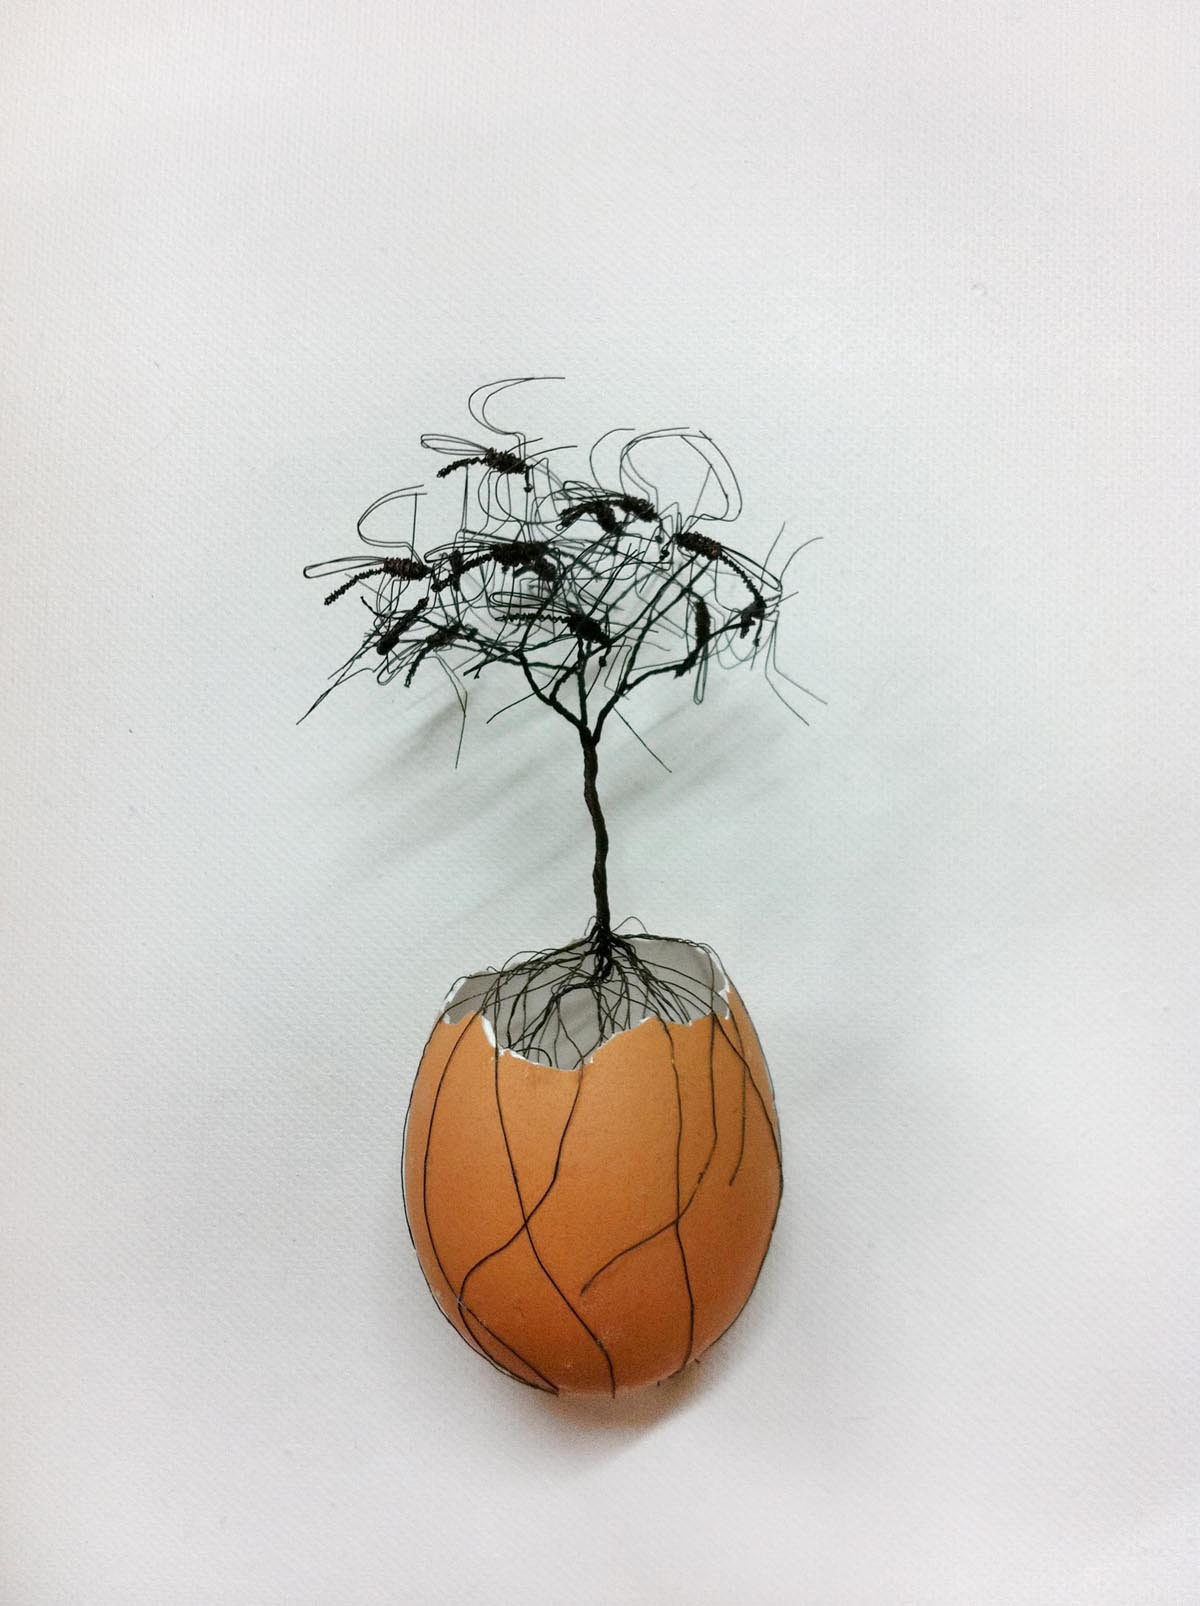 Opera dell'artista Daeyoung Kang